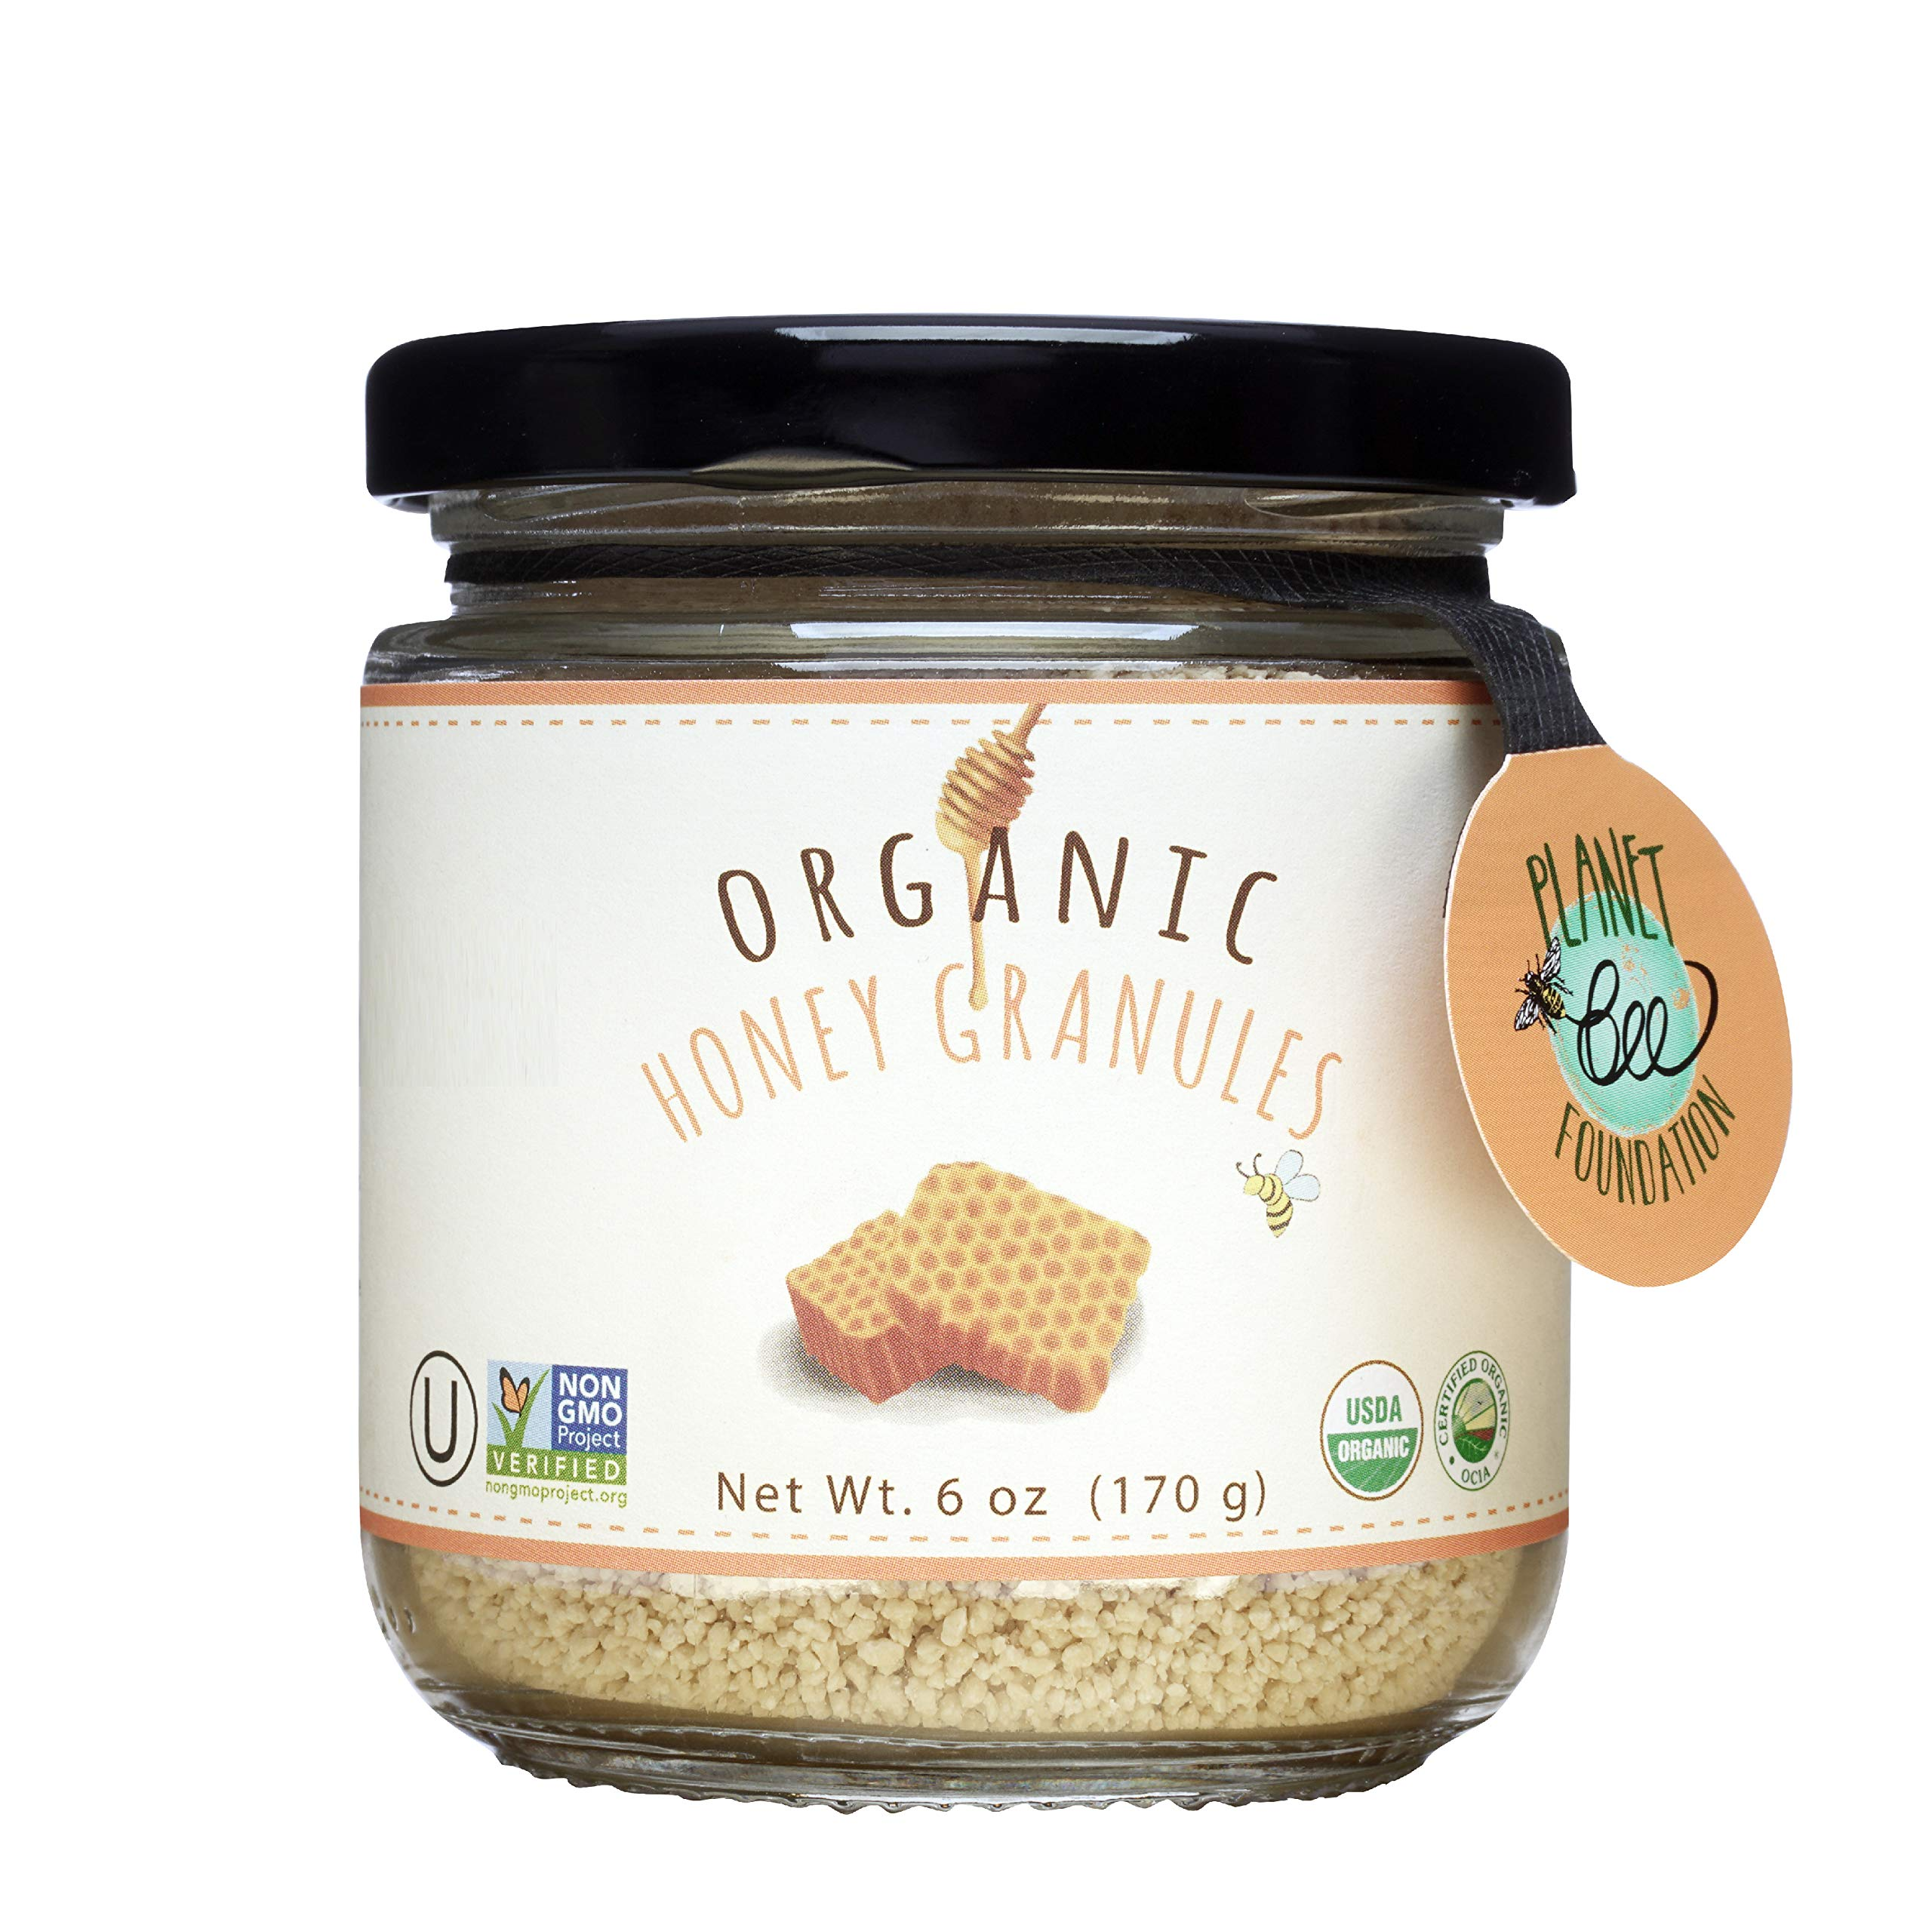 GREENBOW Organic Honey Granules - 100% USDA Certified Organic, Gluten Free, Non-GMO Organic Honey Granules - Highest Quality Whole Food Organic Honey Granules – 6oz (170g)